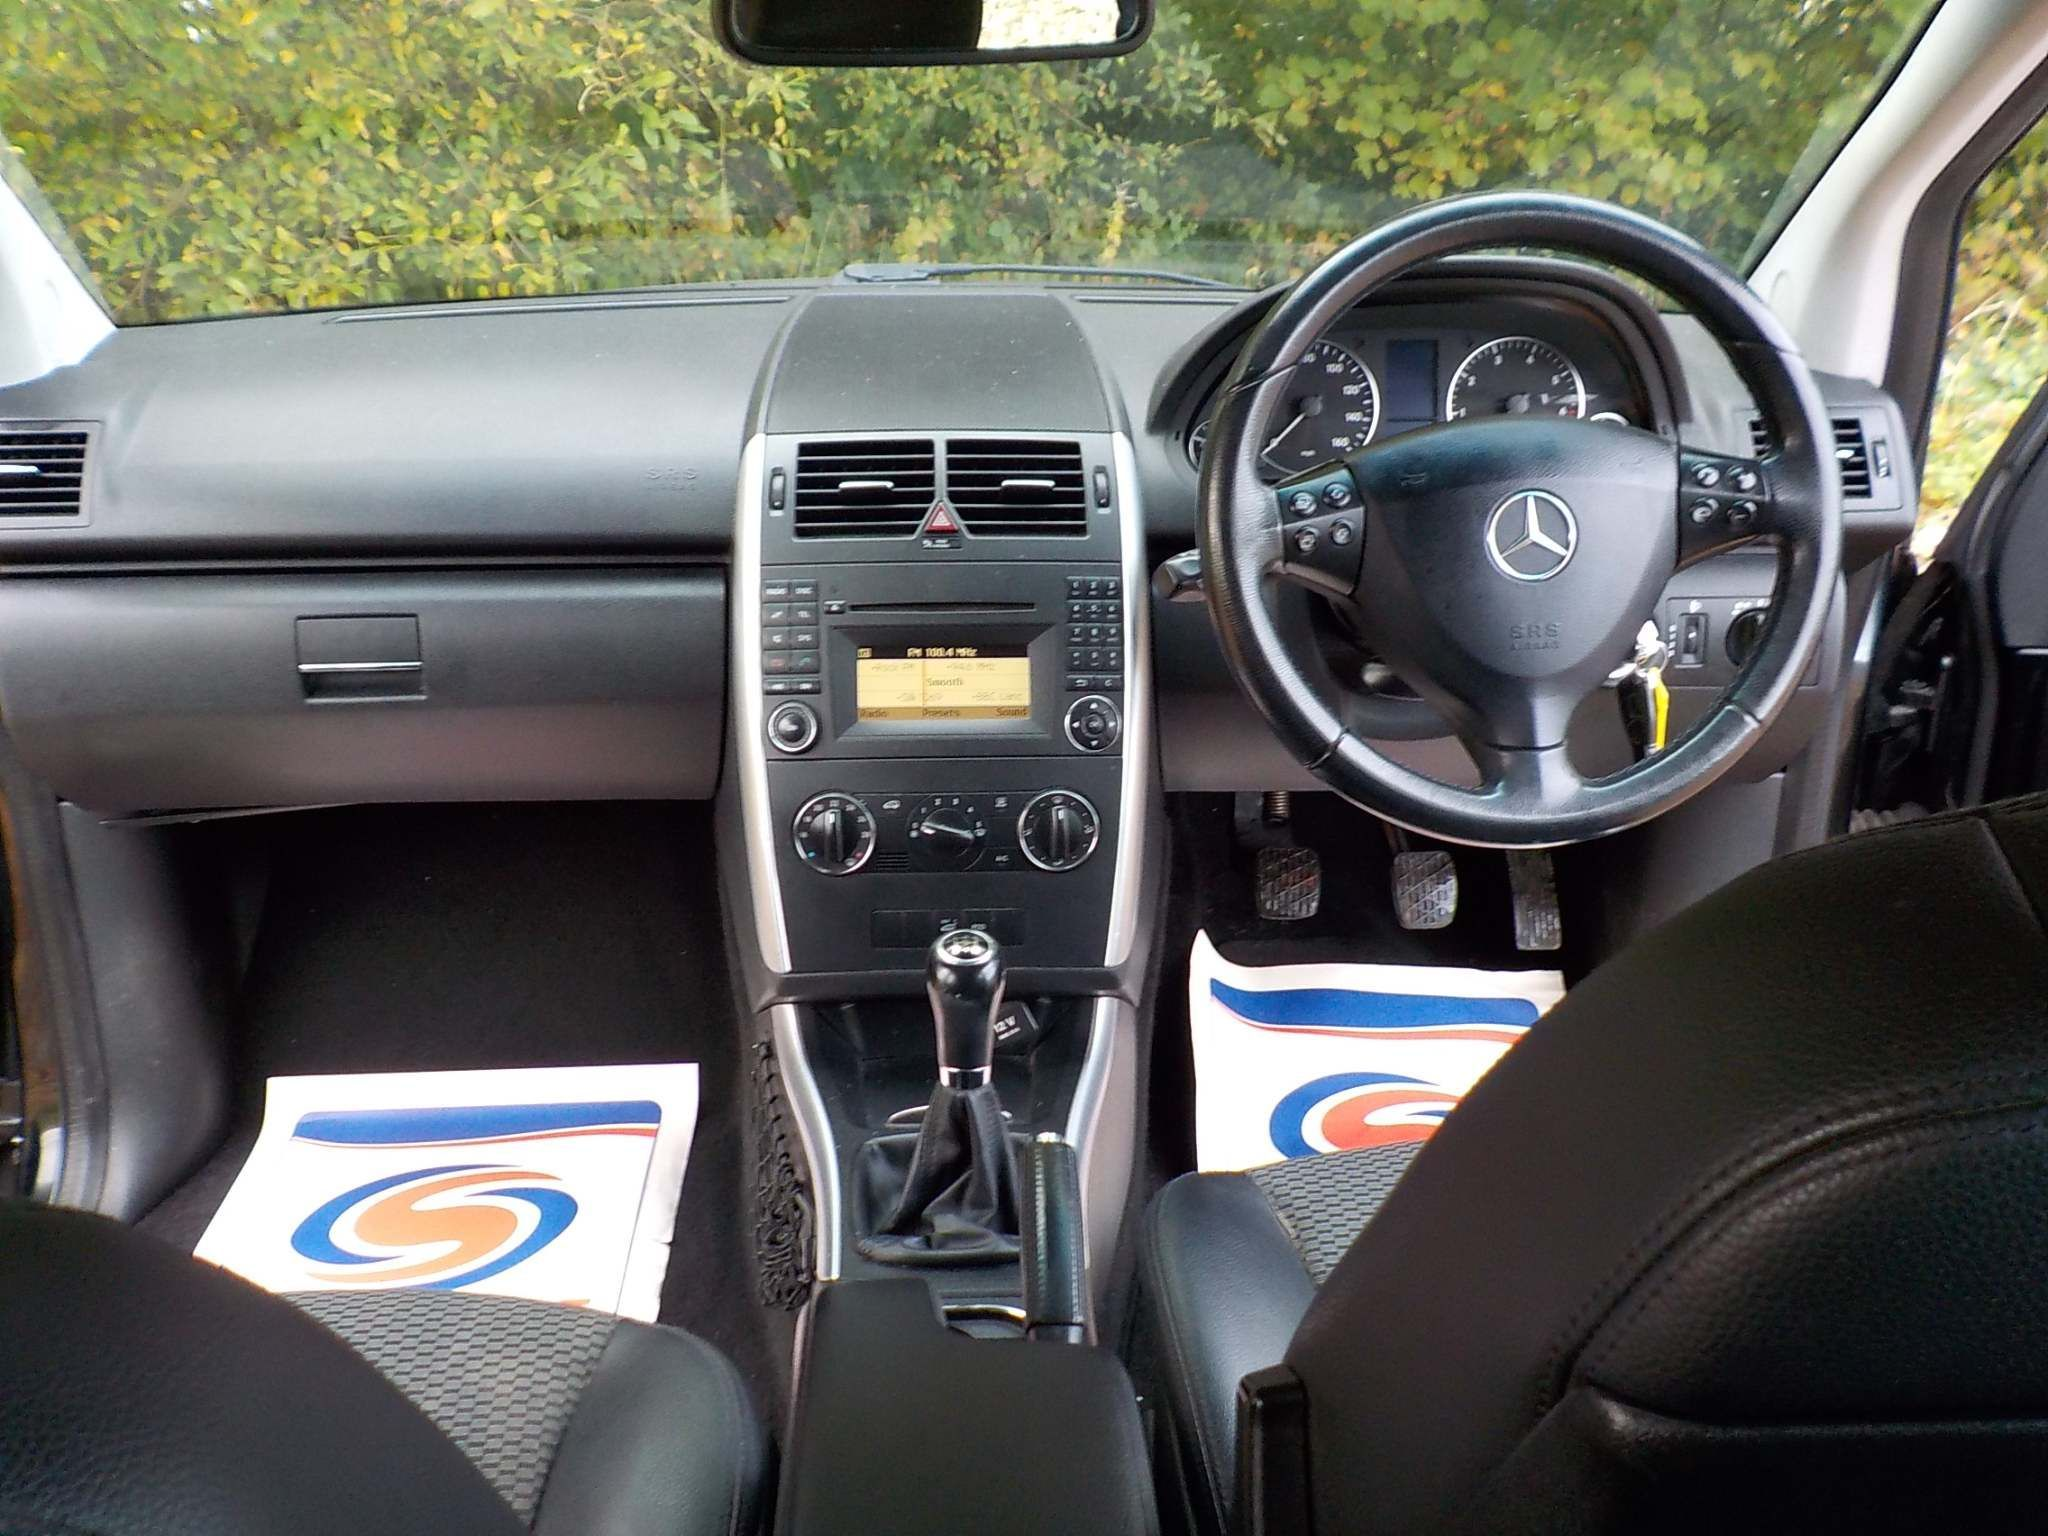 Mercedes-Benz A Class 1.5 A150 Avantgarde SE 5dr